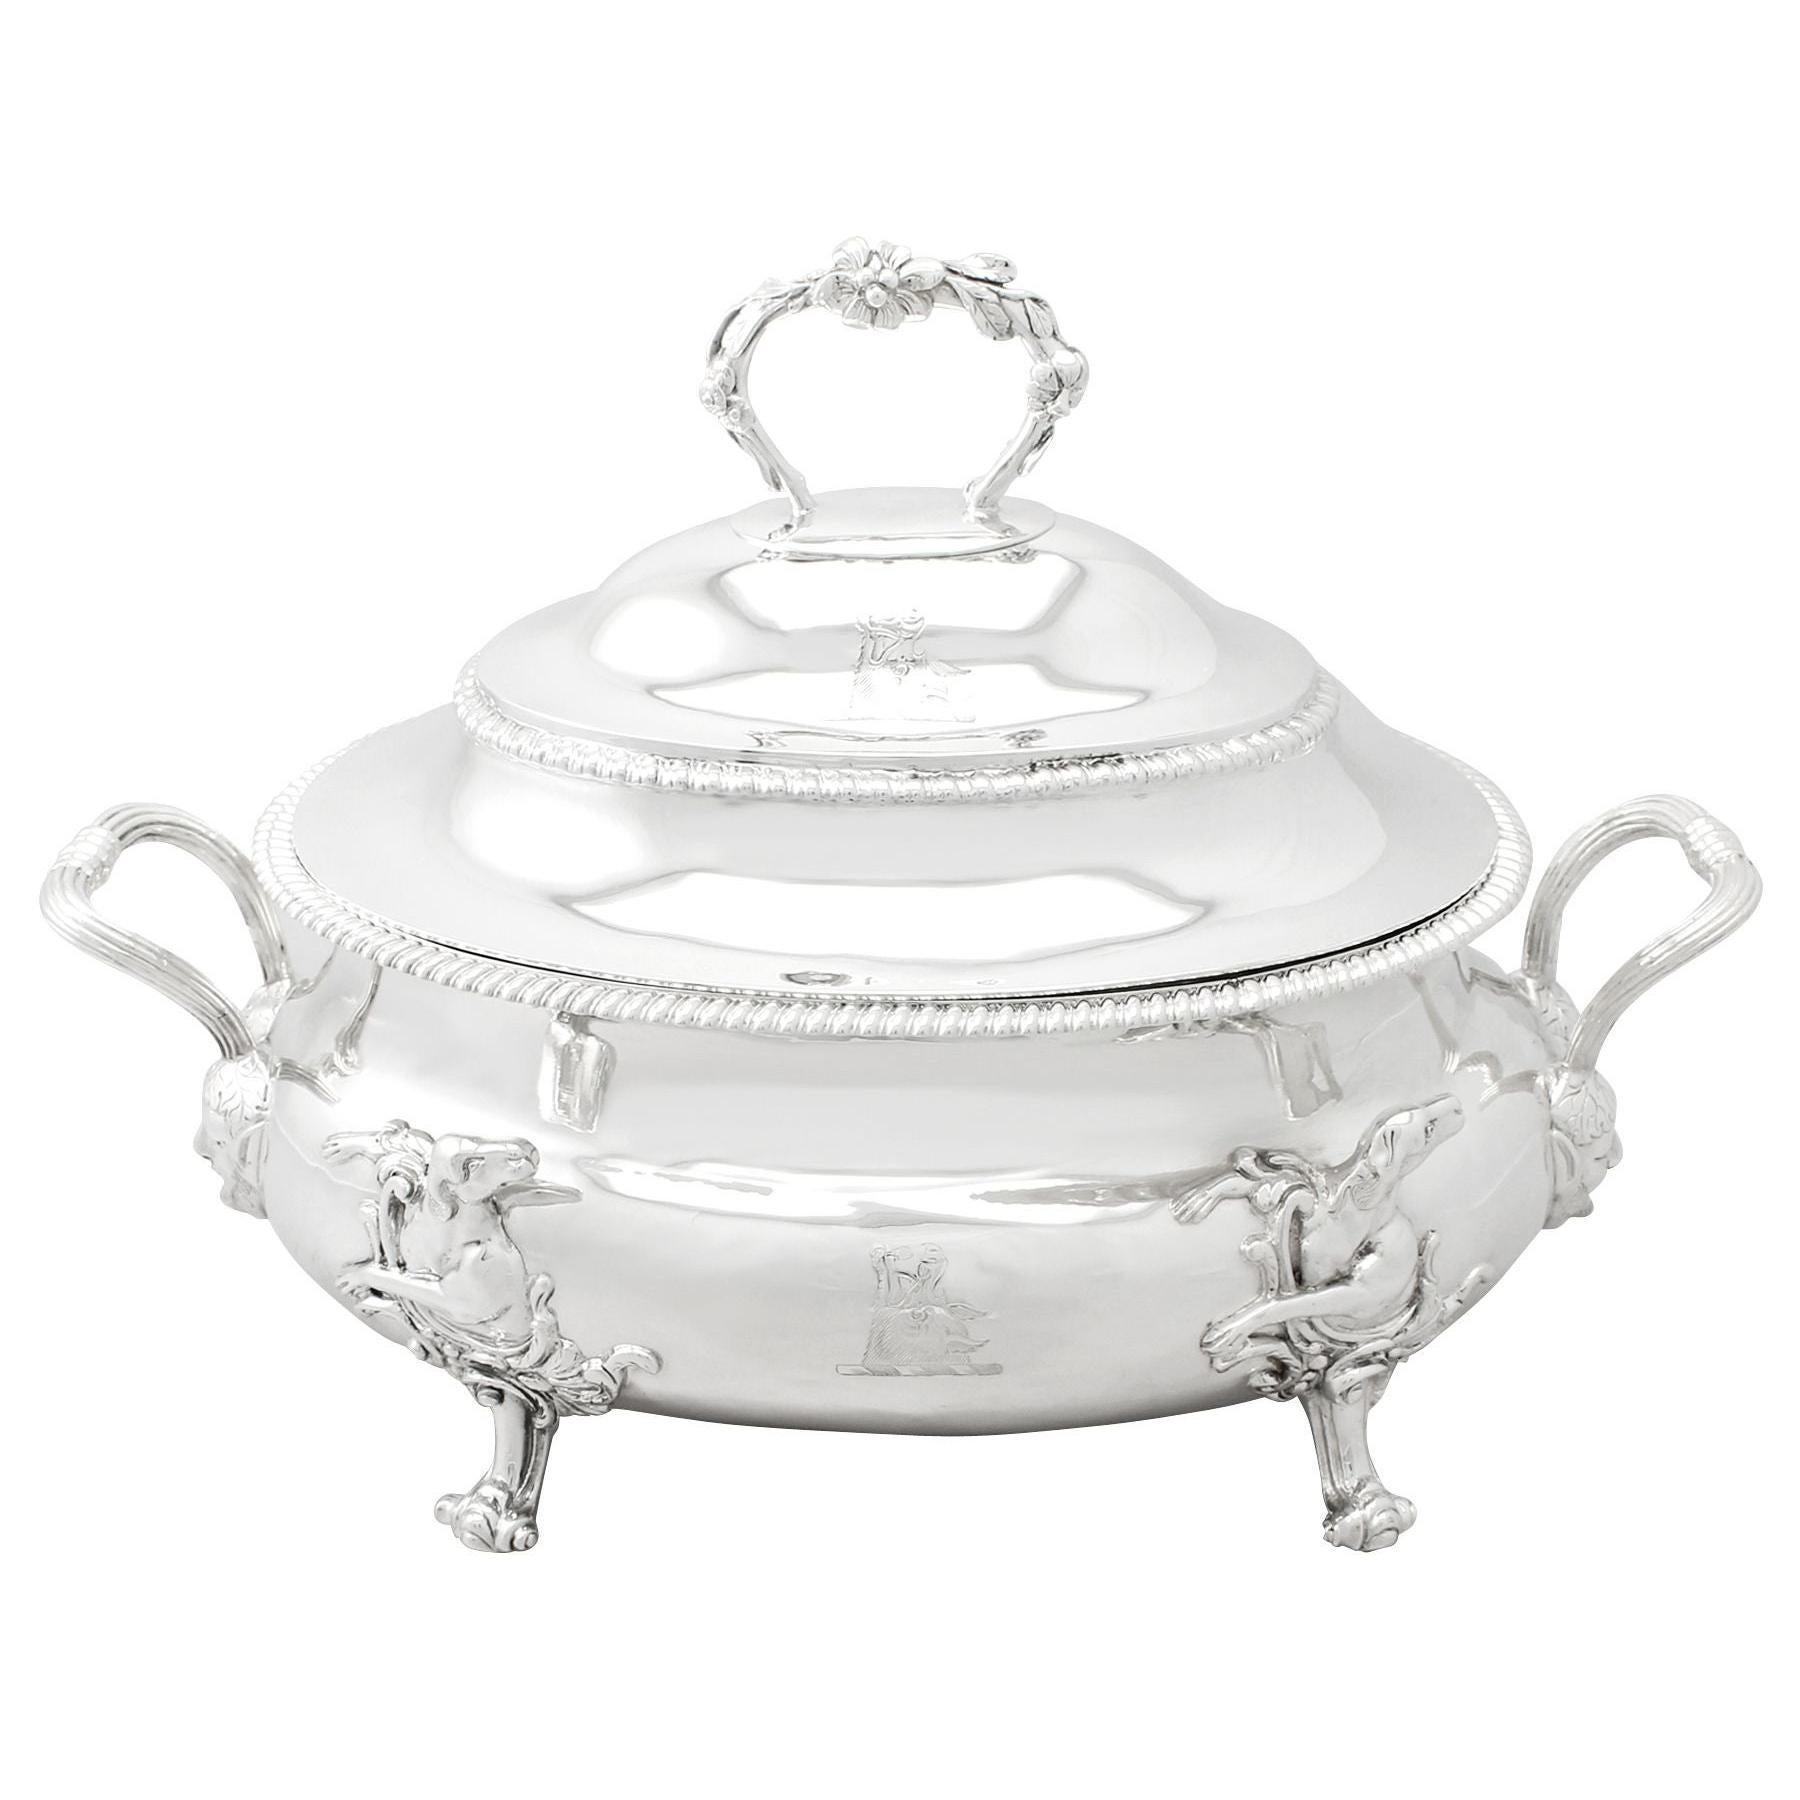 Antique Georgian English Sterling Silver Soup Tureen